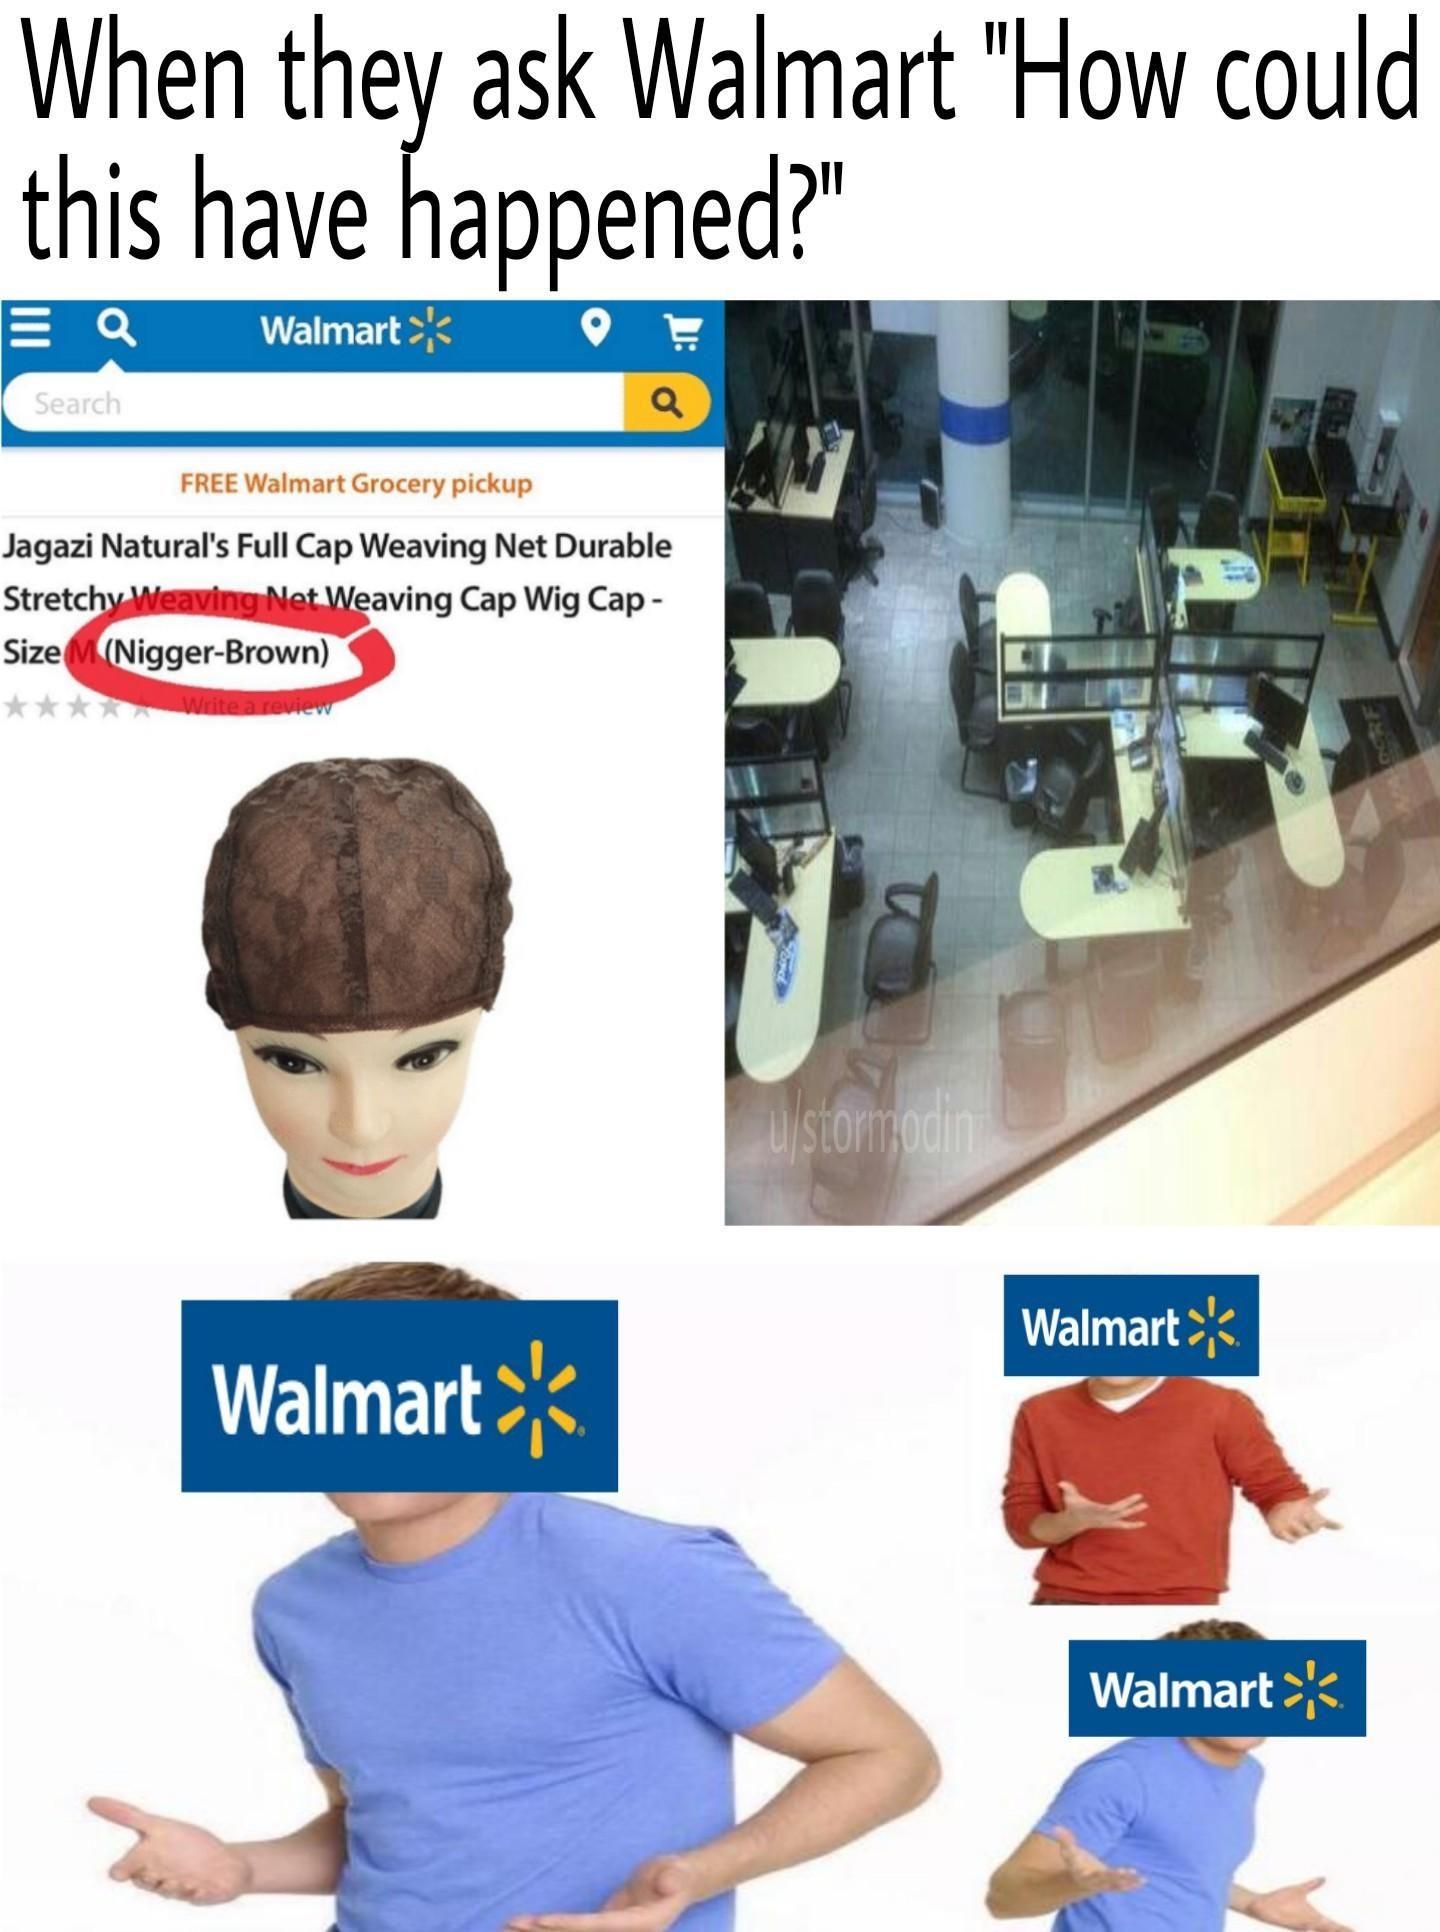 Walmart Is Edgy Af